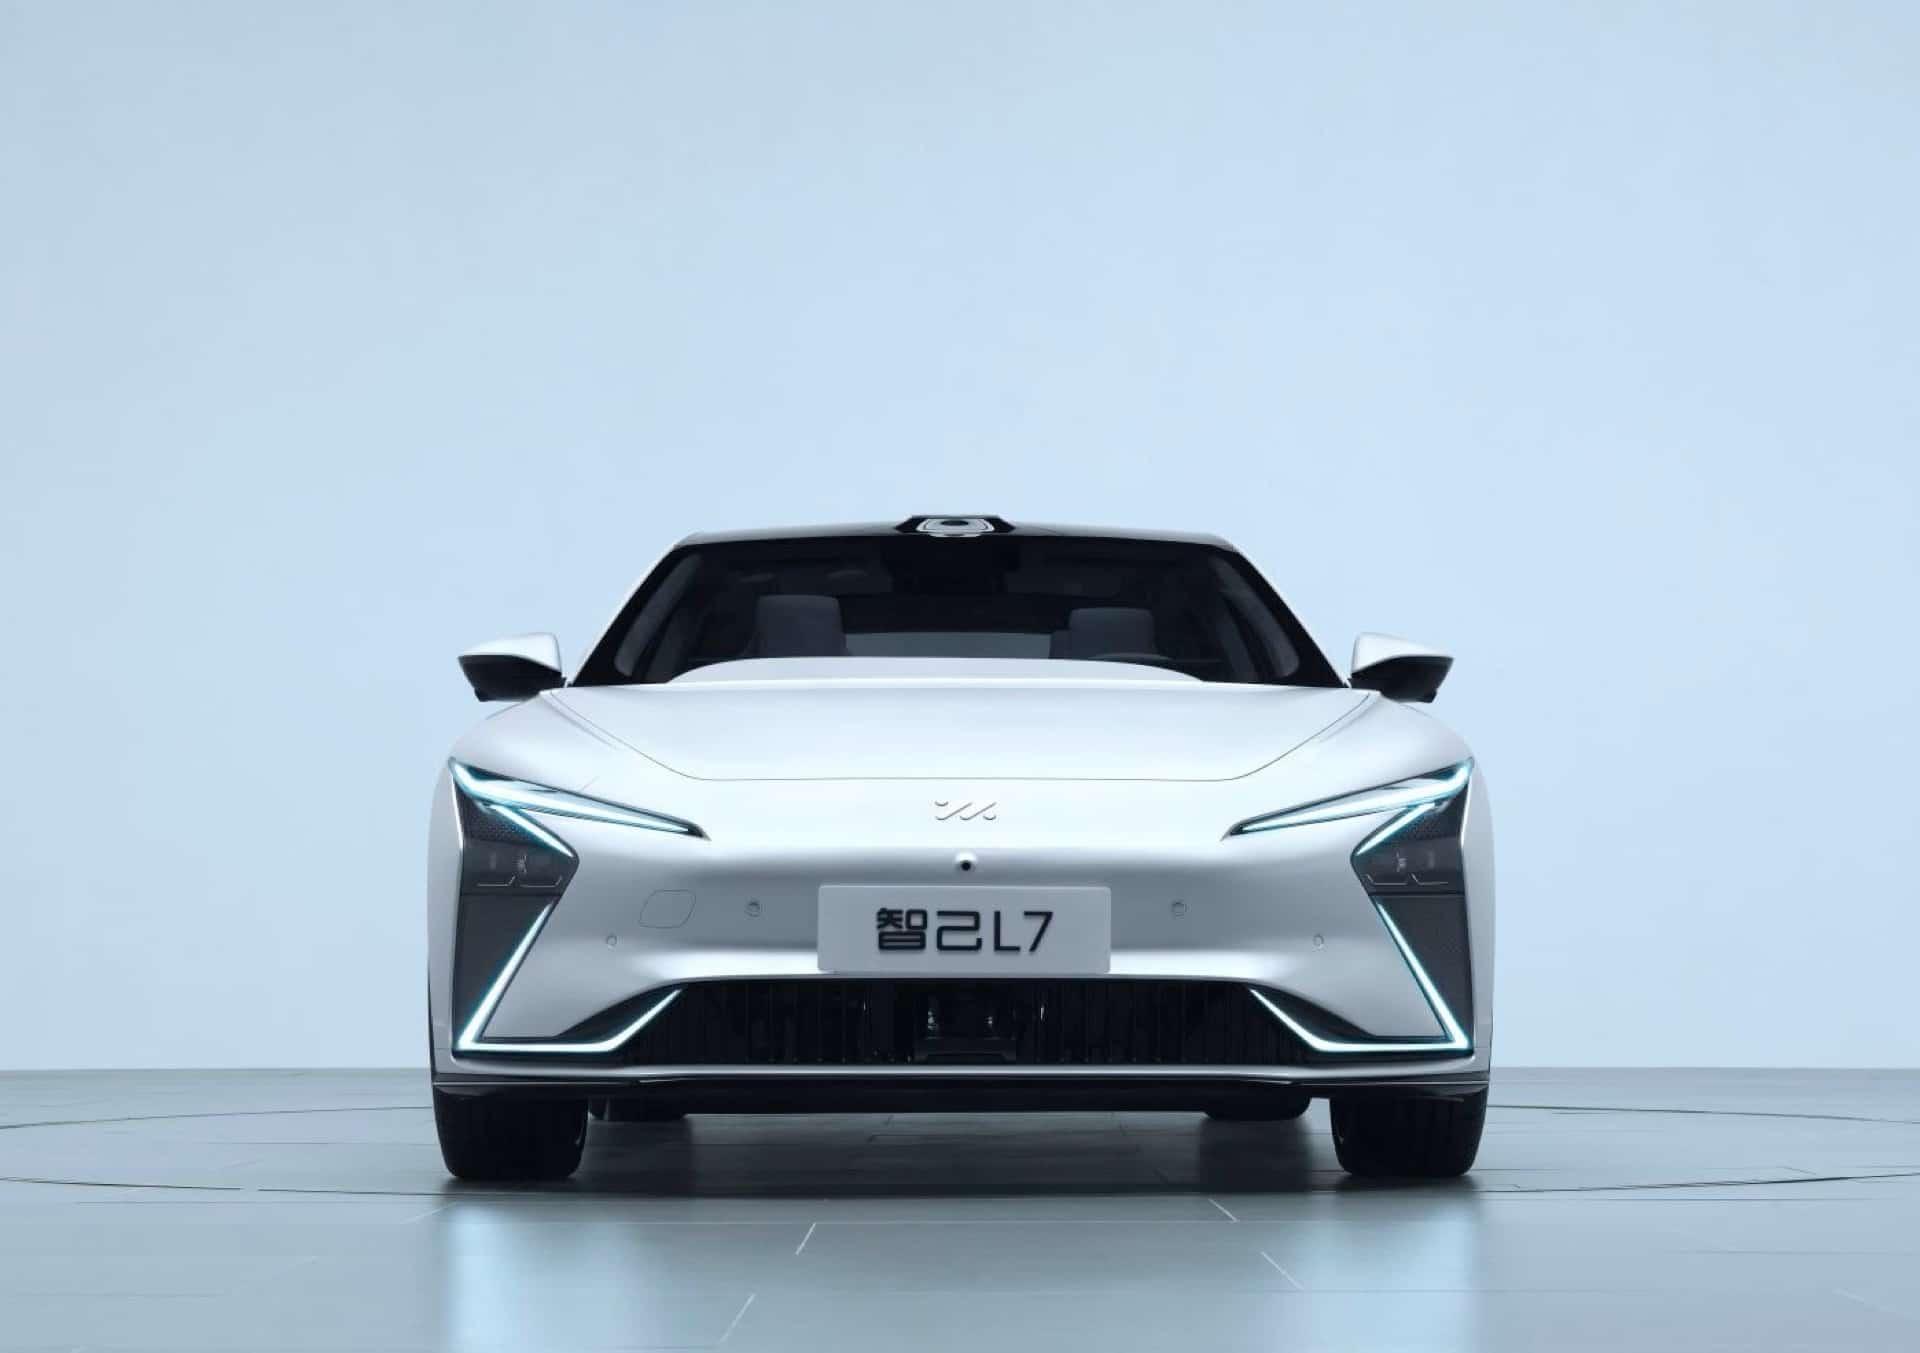 Электромобиль Zhiji L7 от Alibaba